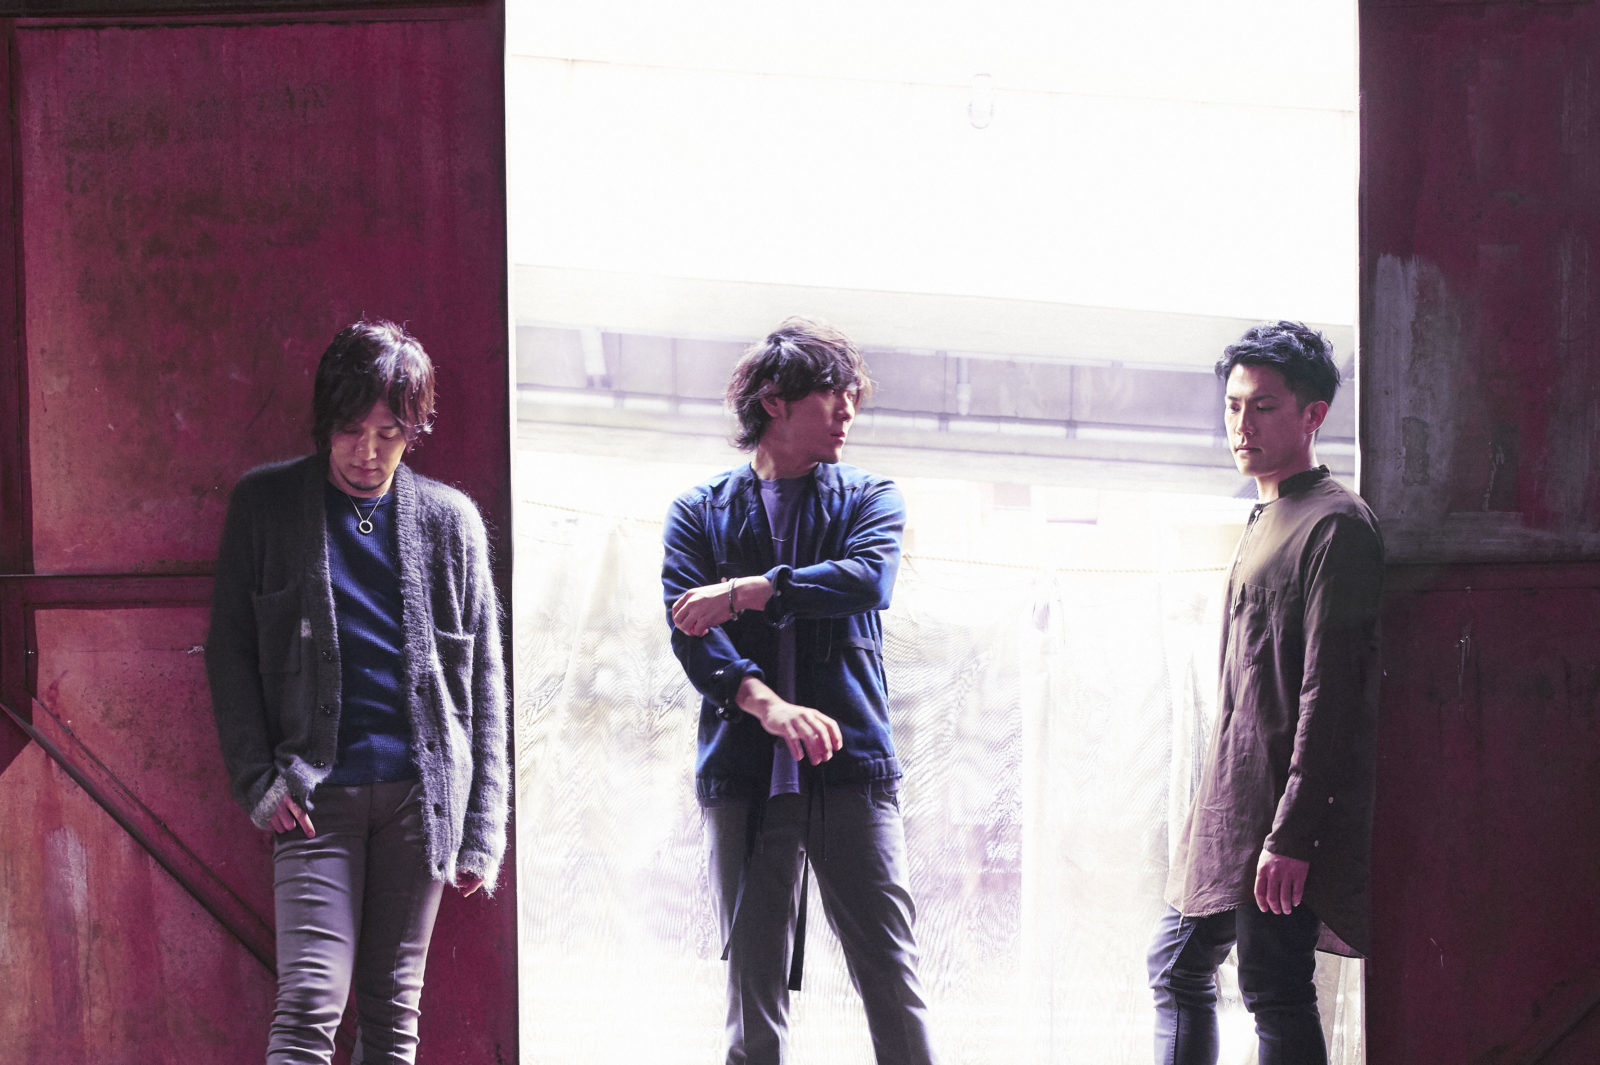 D-LITE(from BIGBANG)は3曲同時ランクイン!ディーン・フジオカも名を連ねる今注目の歌詞ランキング1位は、佐藤健×土屋太鳳の出演映画主題歌